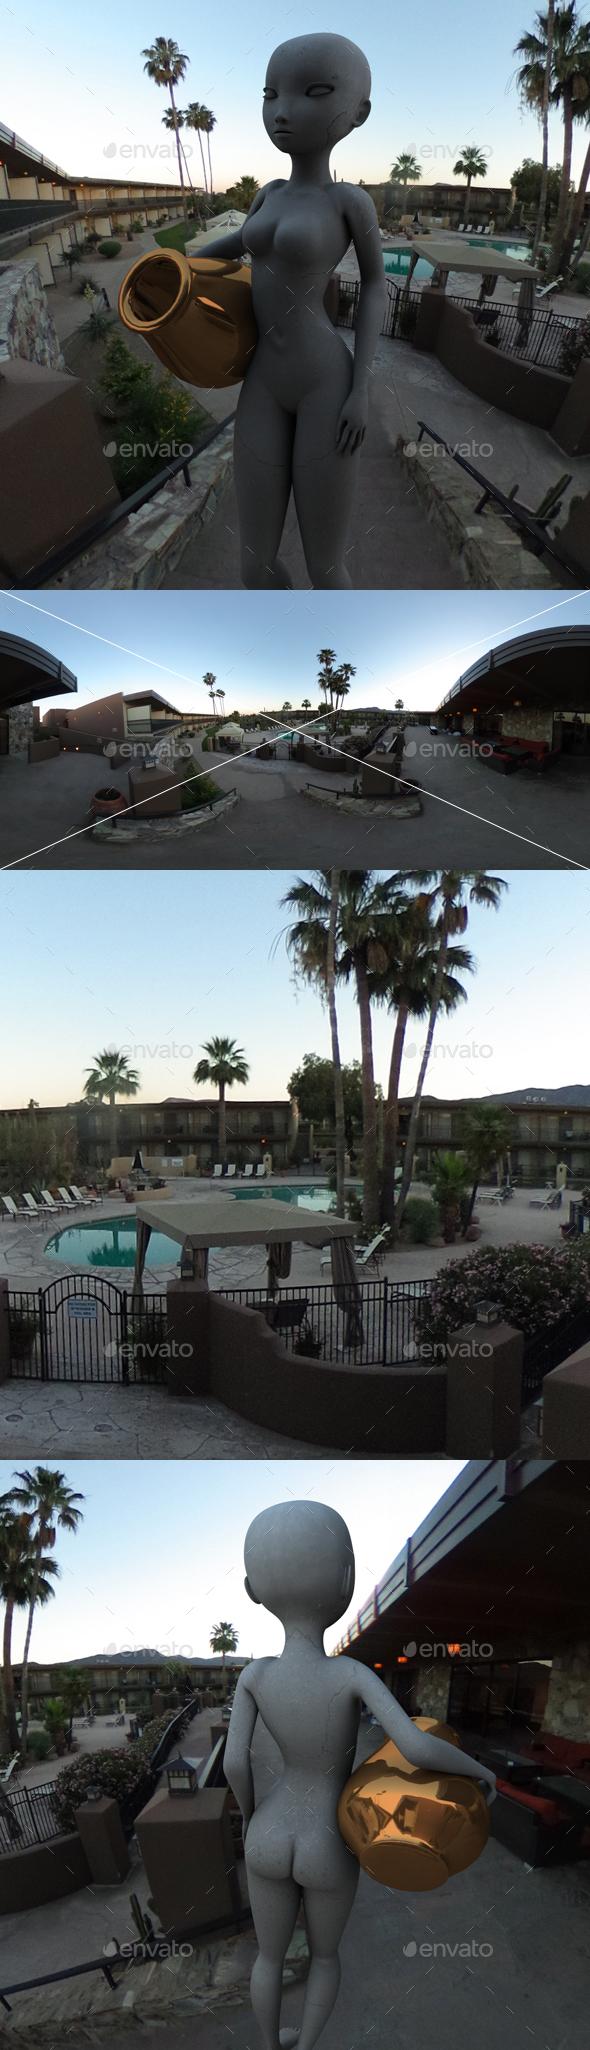 Morning Arizona Hotel HDRI - 3DOcean Item for Sale